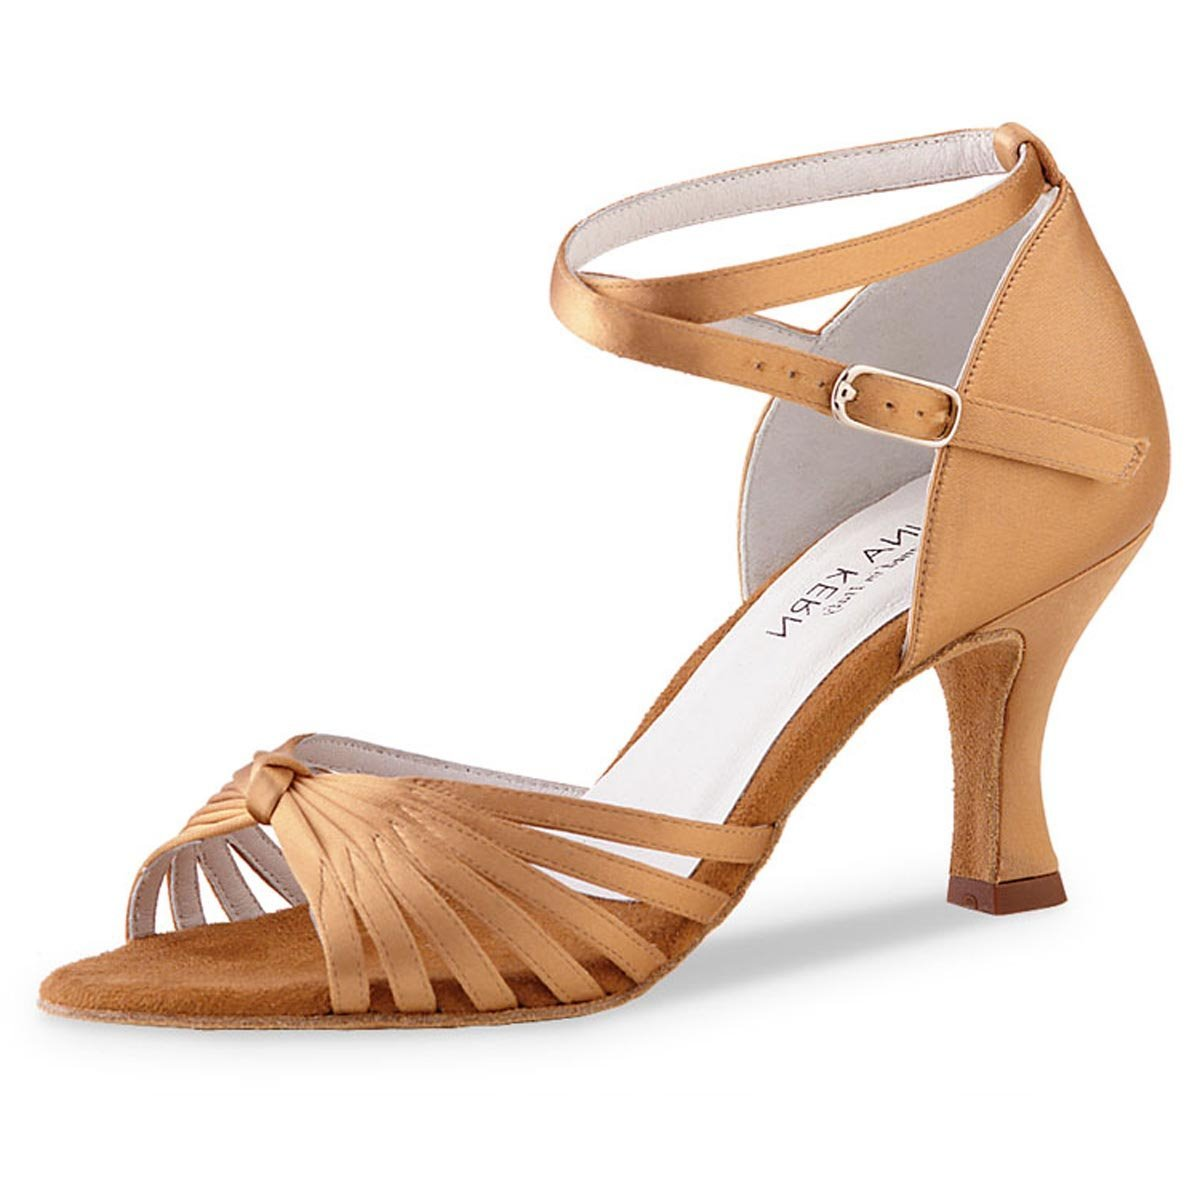 Anna Kern - Damen Tanzschuhe 526-60 - Satin Bronze - 6 cm B071YBMJNL Tanzschuhe Neu